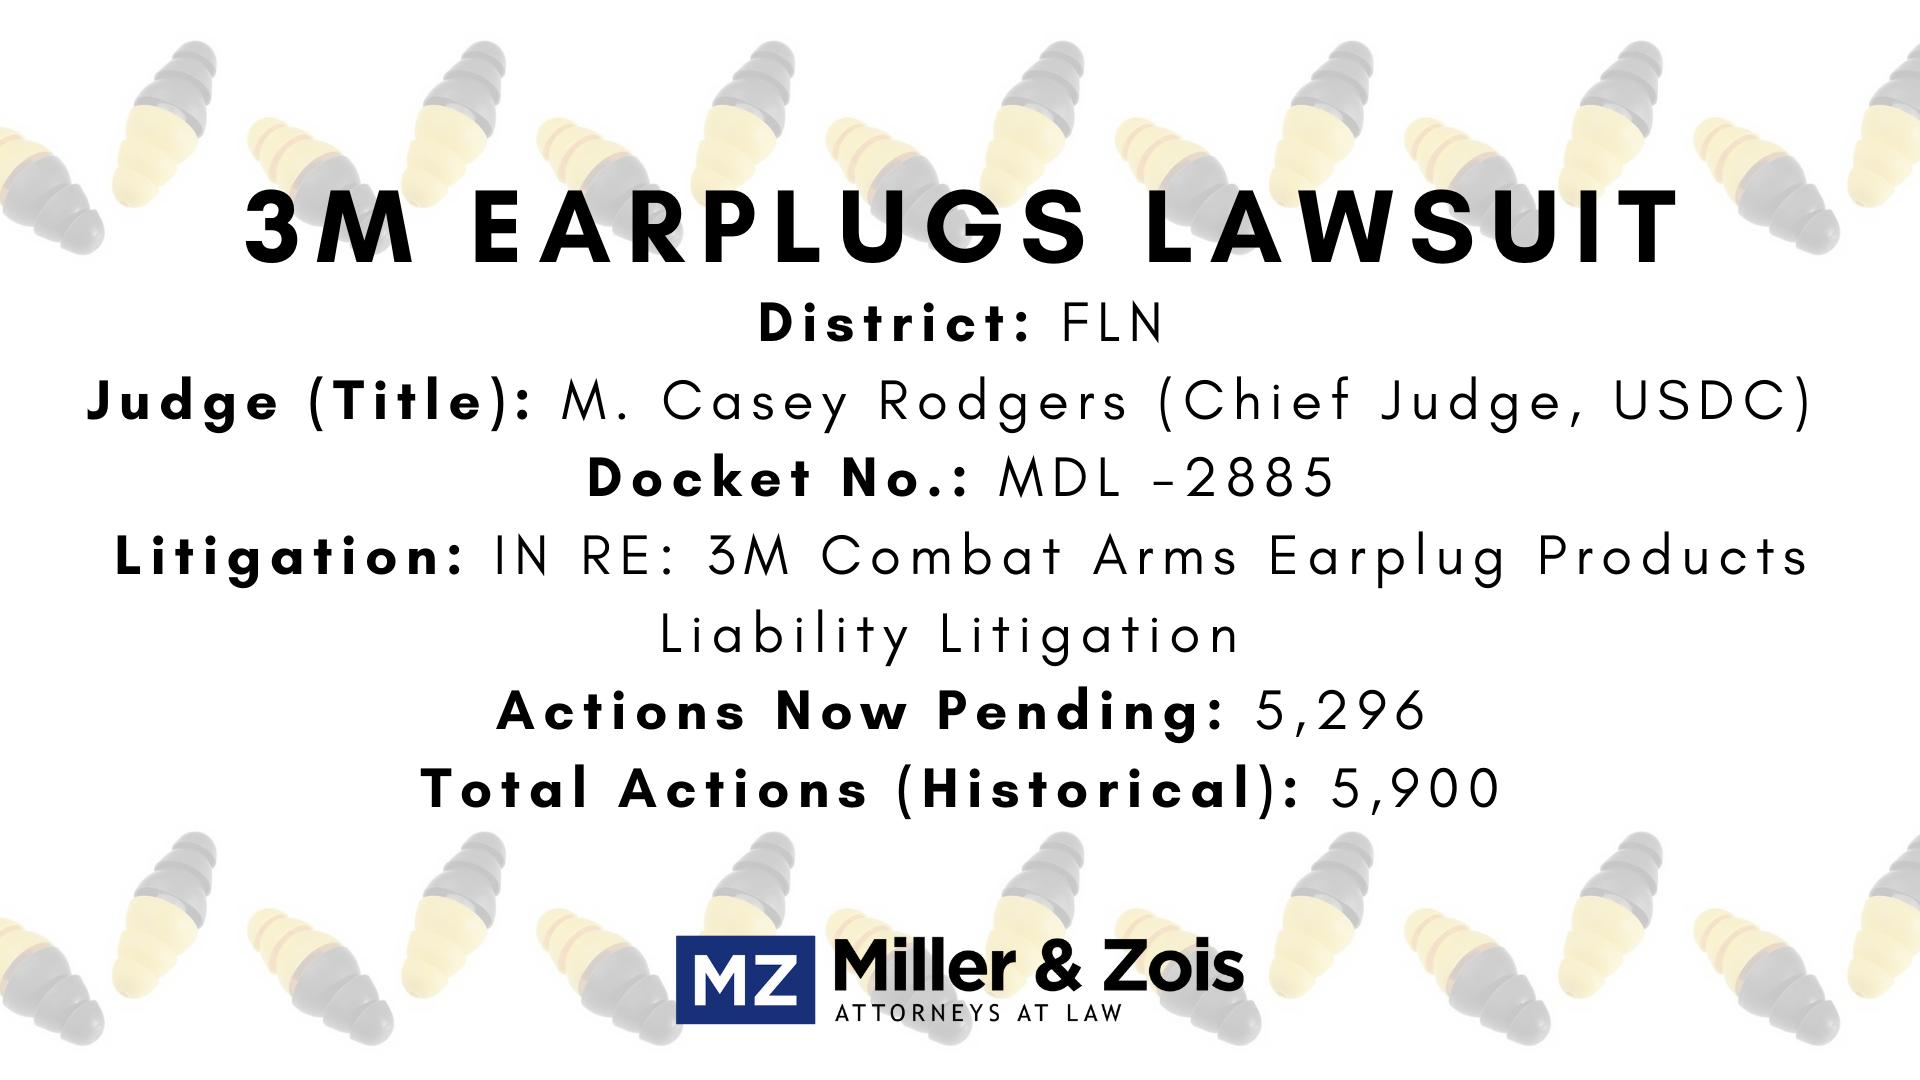 3M Combat Arms Earplugs